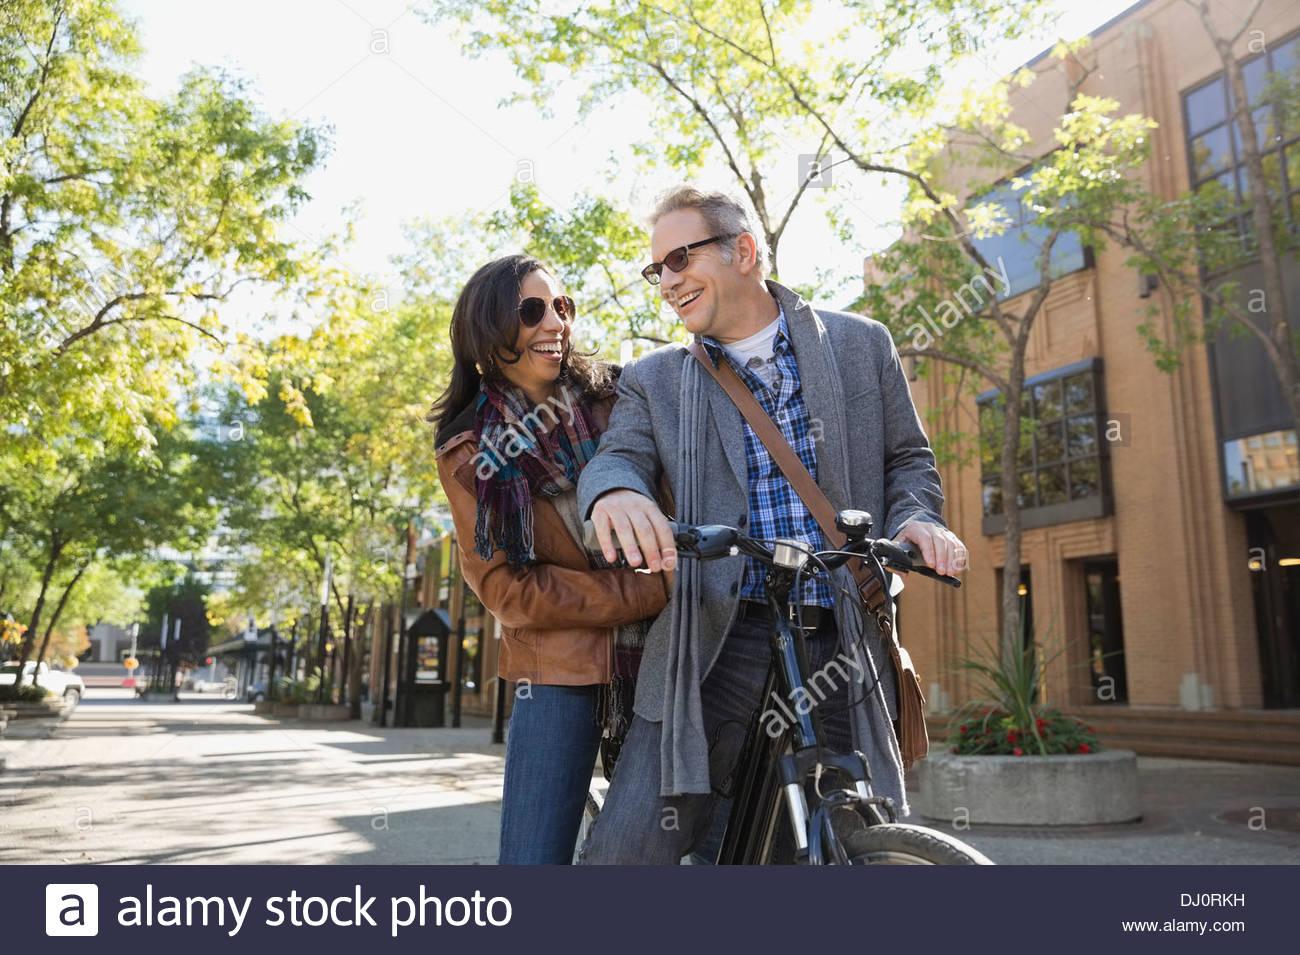 Smiling couple sitting on bicycle - Stock Image